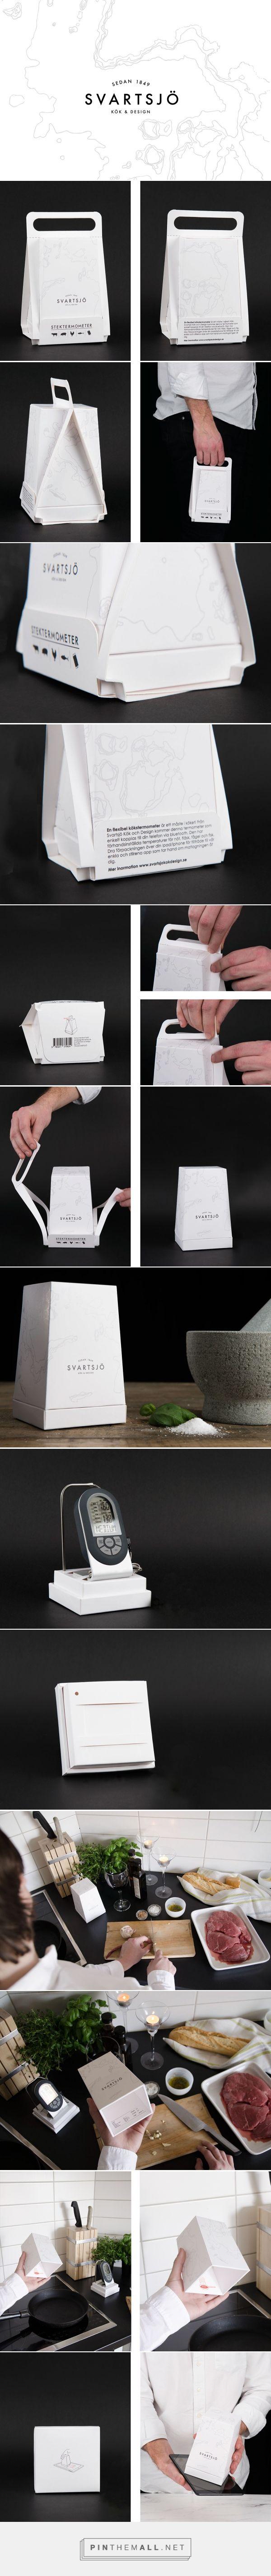 Svartsjö meat thermometer packaging design with heat sensitive ink by Josefine Johansson, Kinna Andersson, Viktor Andersson - http://www.packagingoftheworld.com/2016/08/svartsjo-concept.html